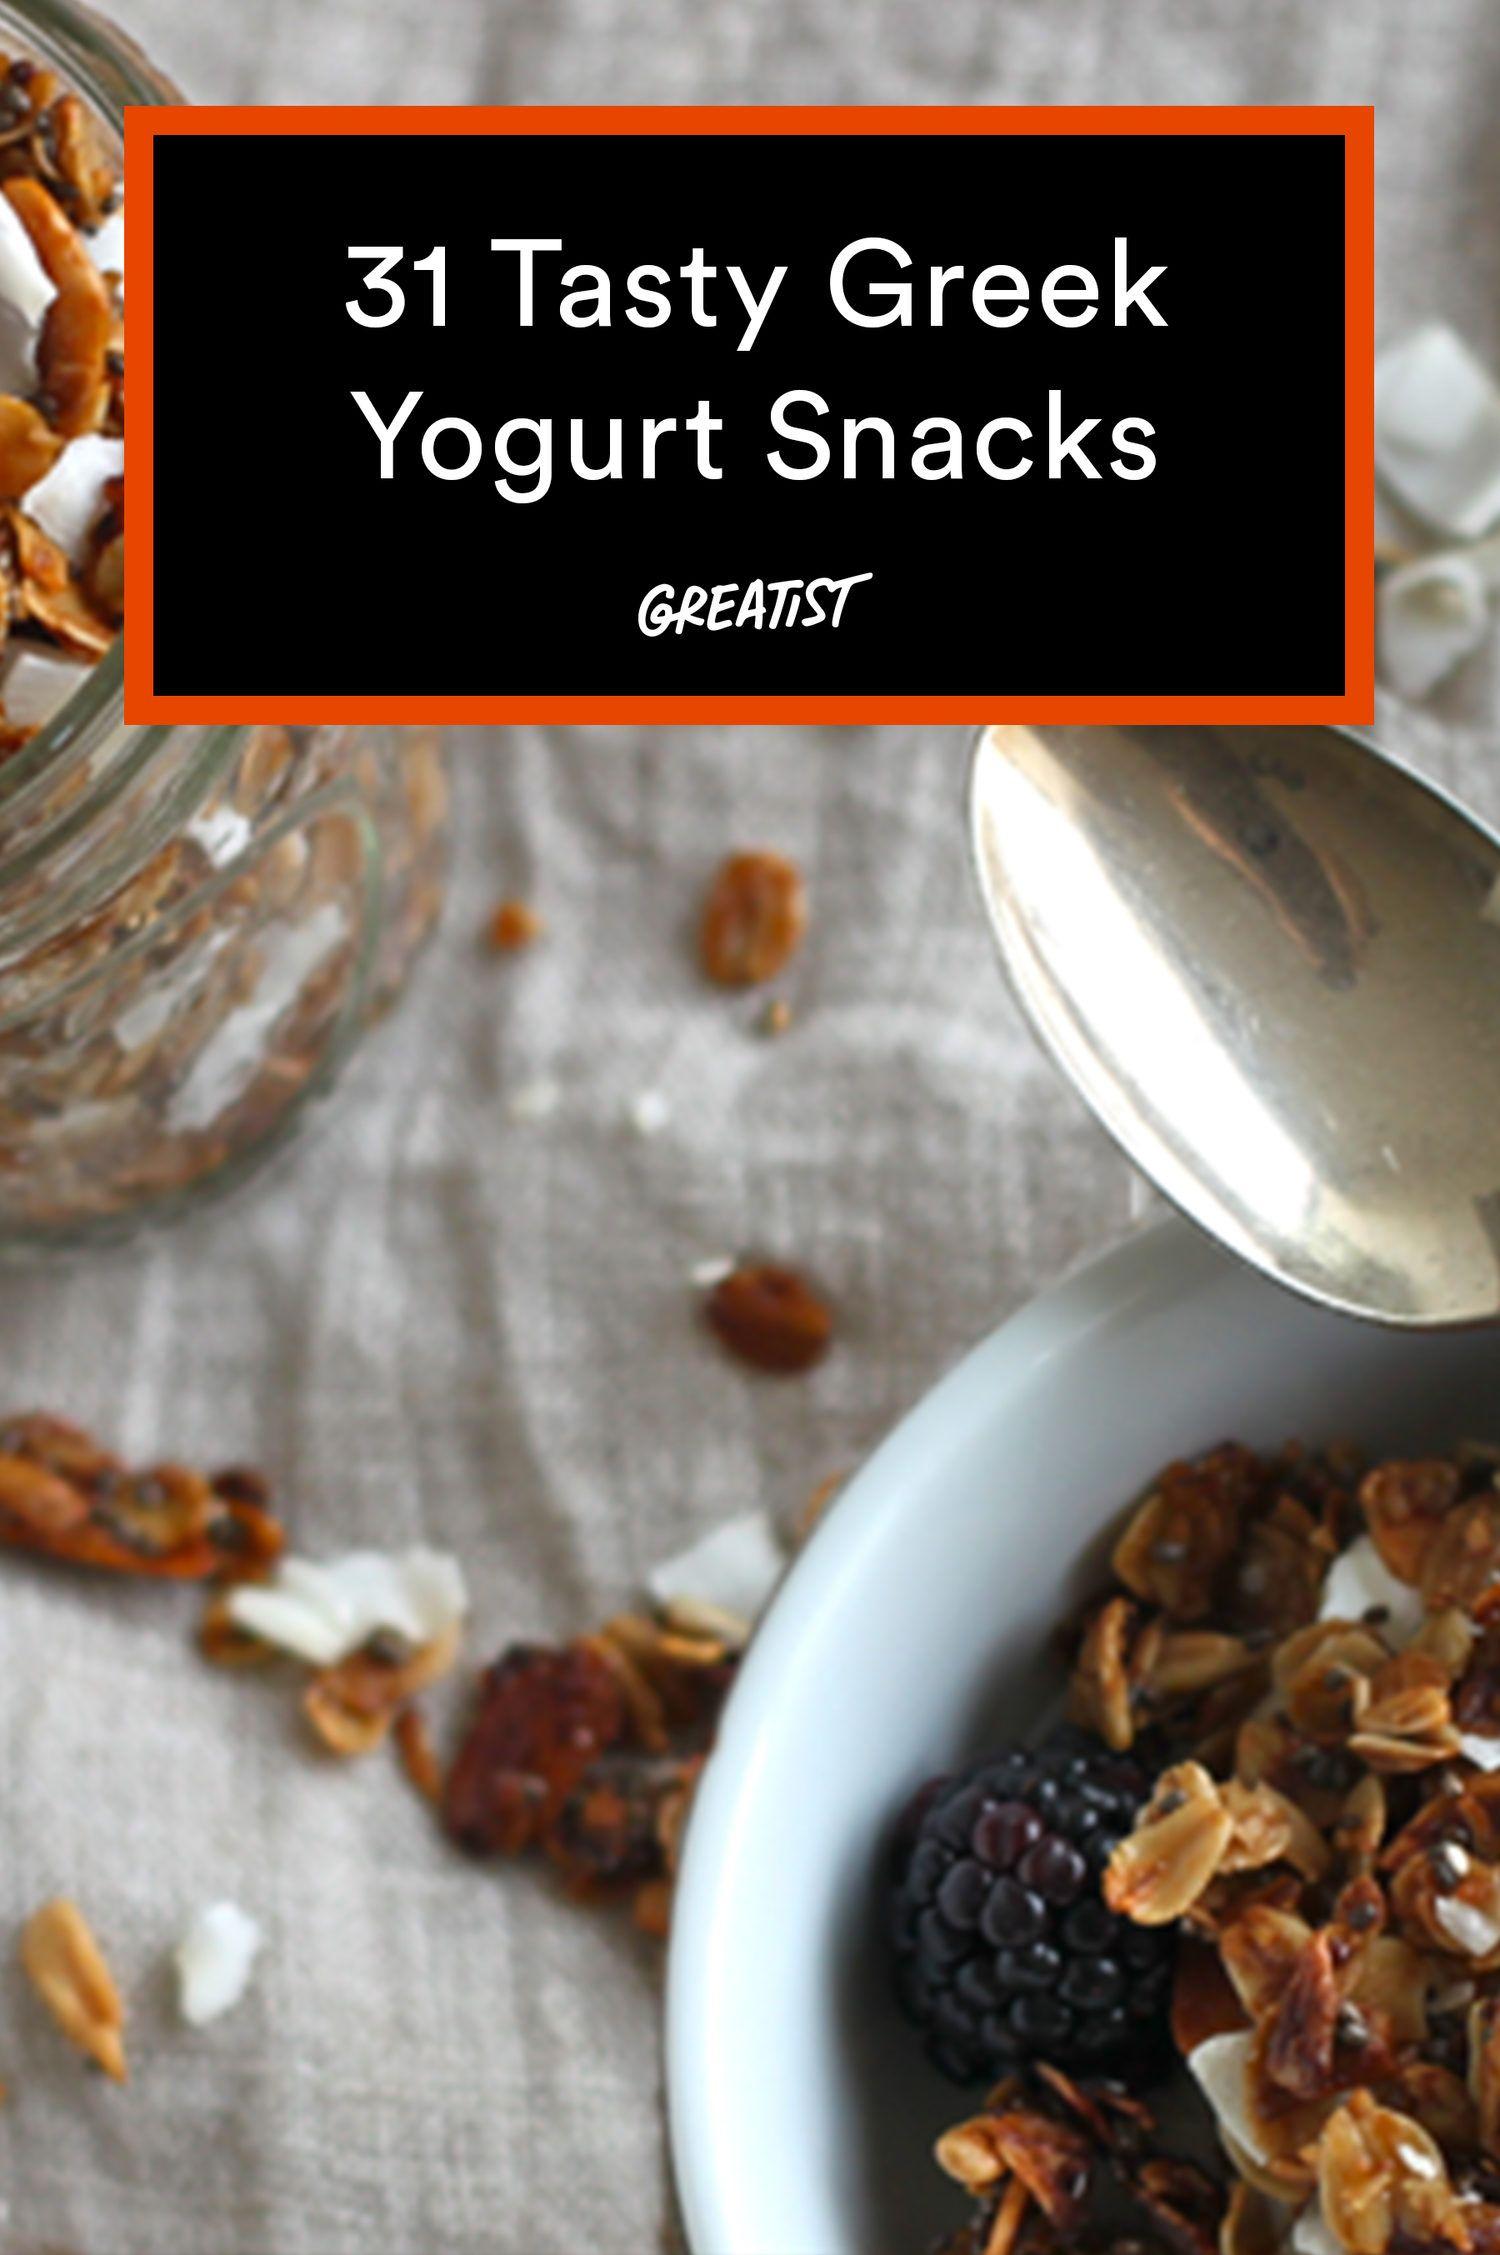 31 Tasty Greek Yogurt Snacks